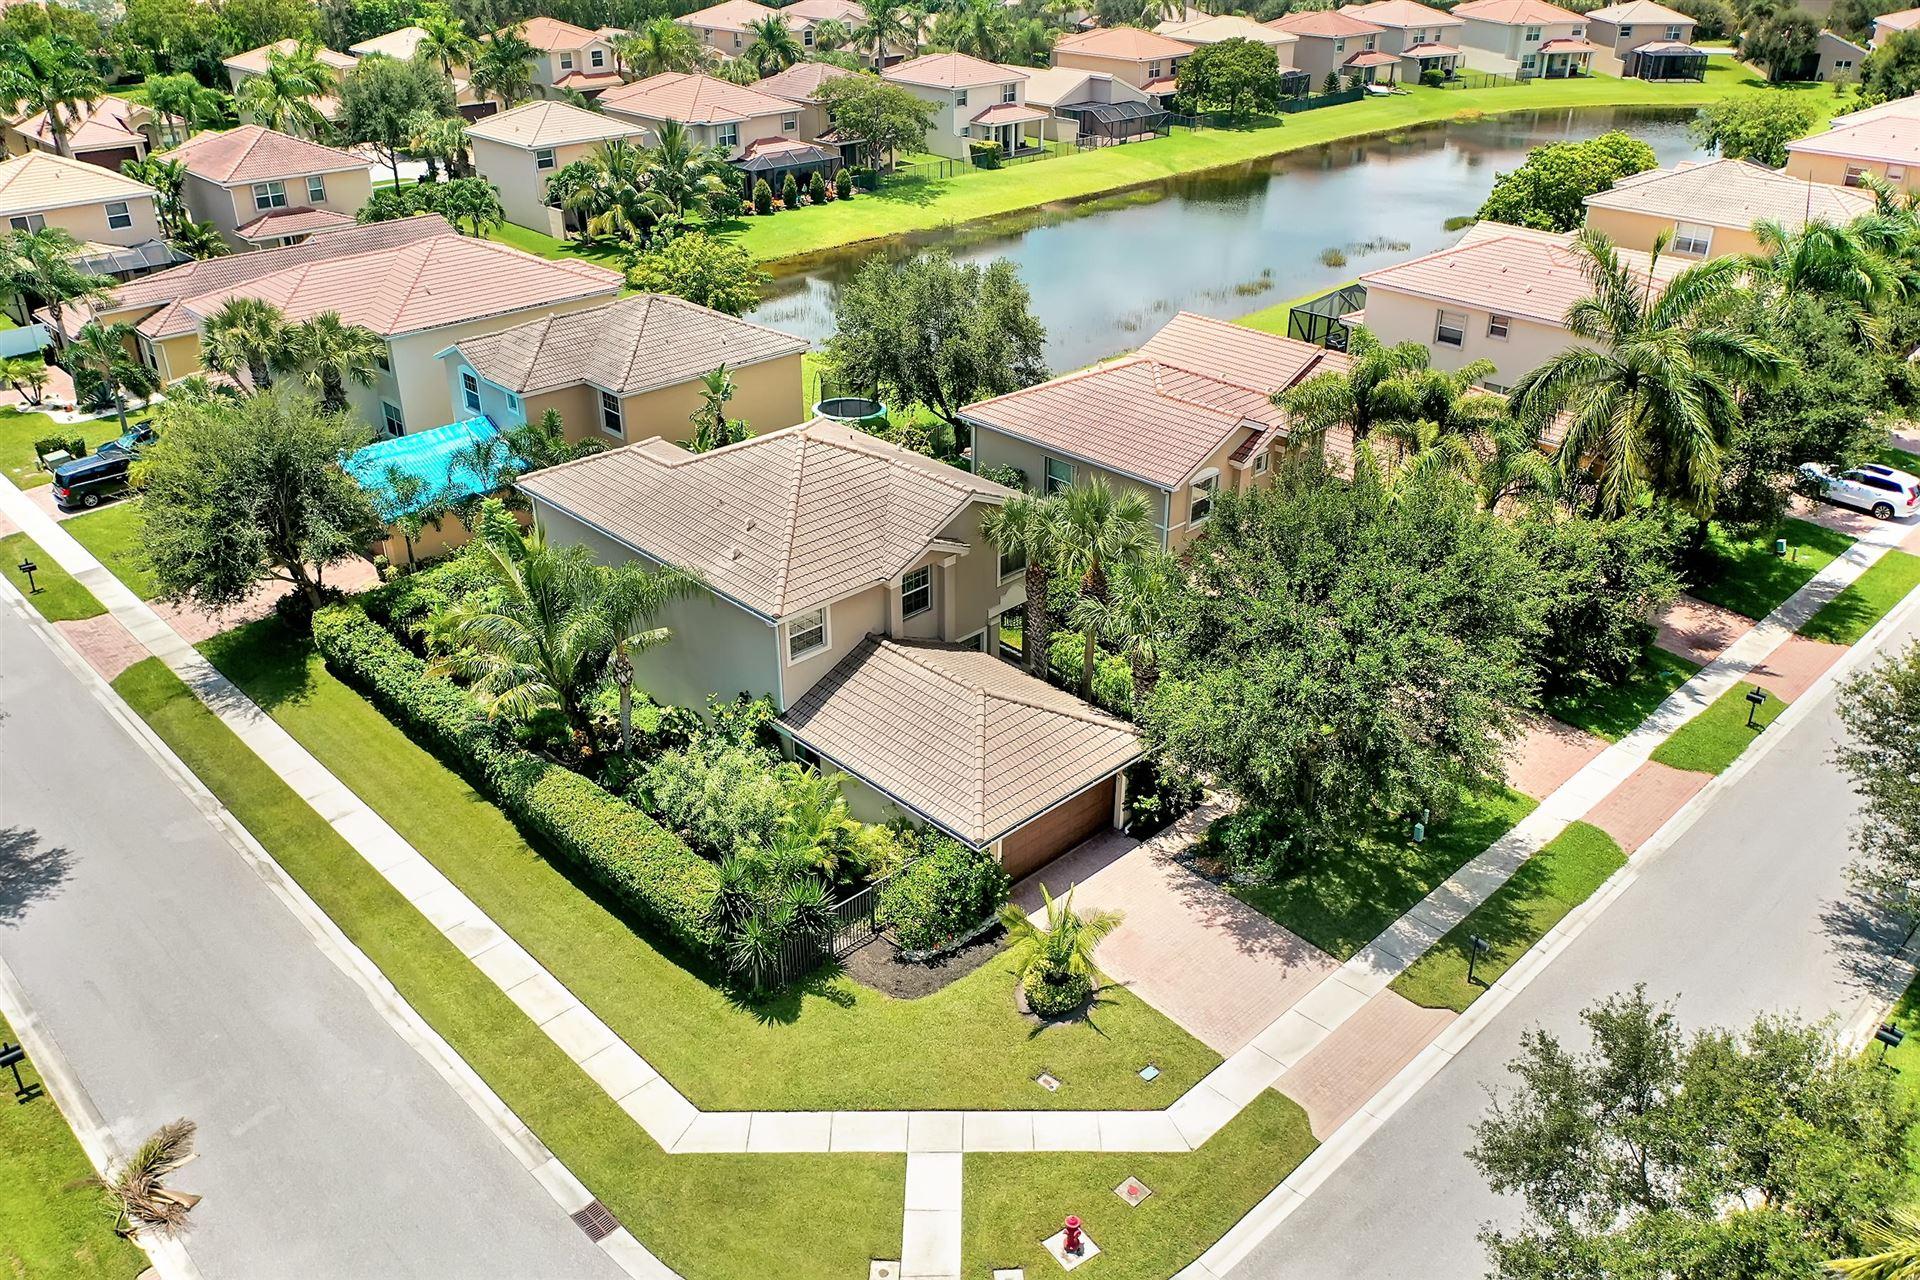 Photo of 7624 Jewelwood Drive, Boynton Beach, FL 33437 (MLS # RX-10733707)